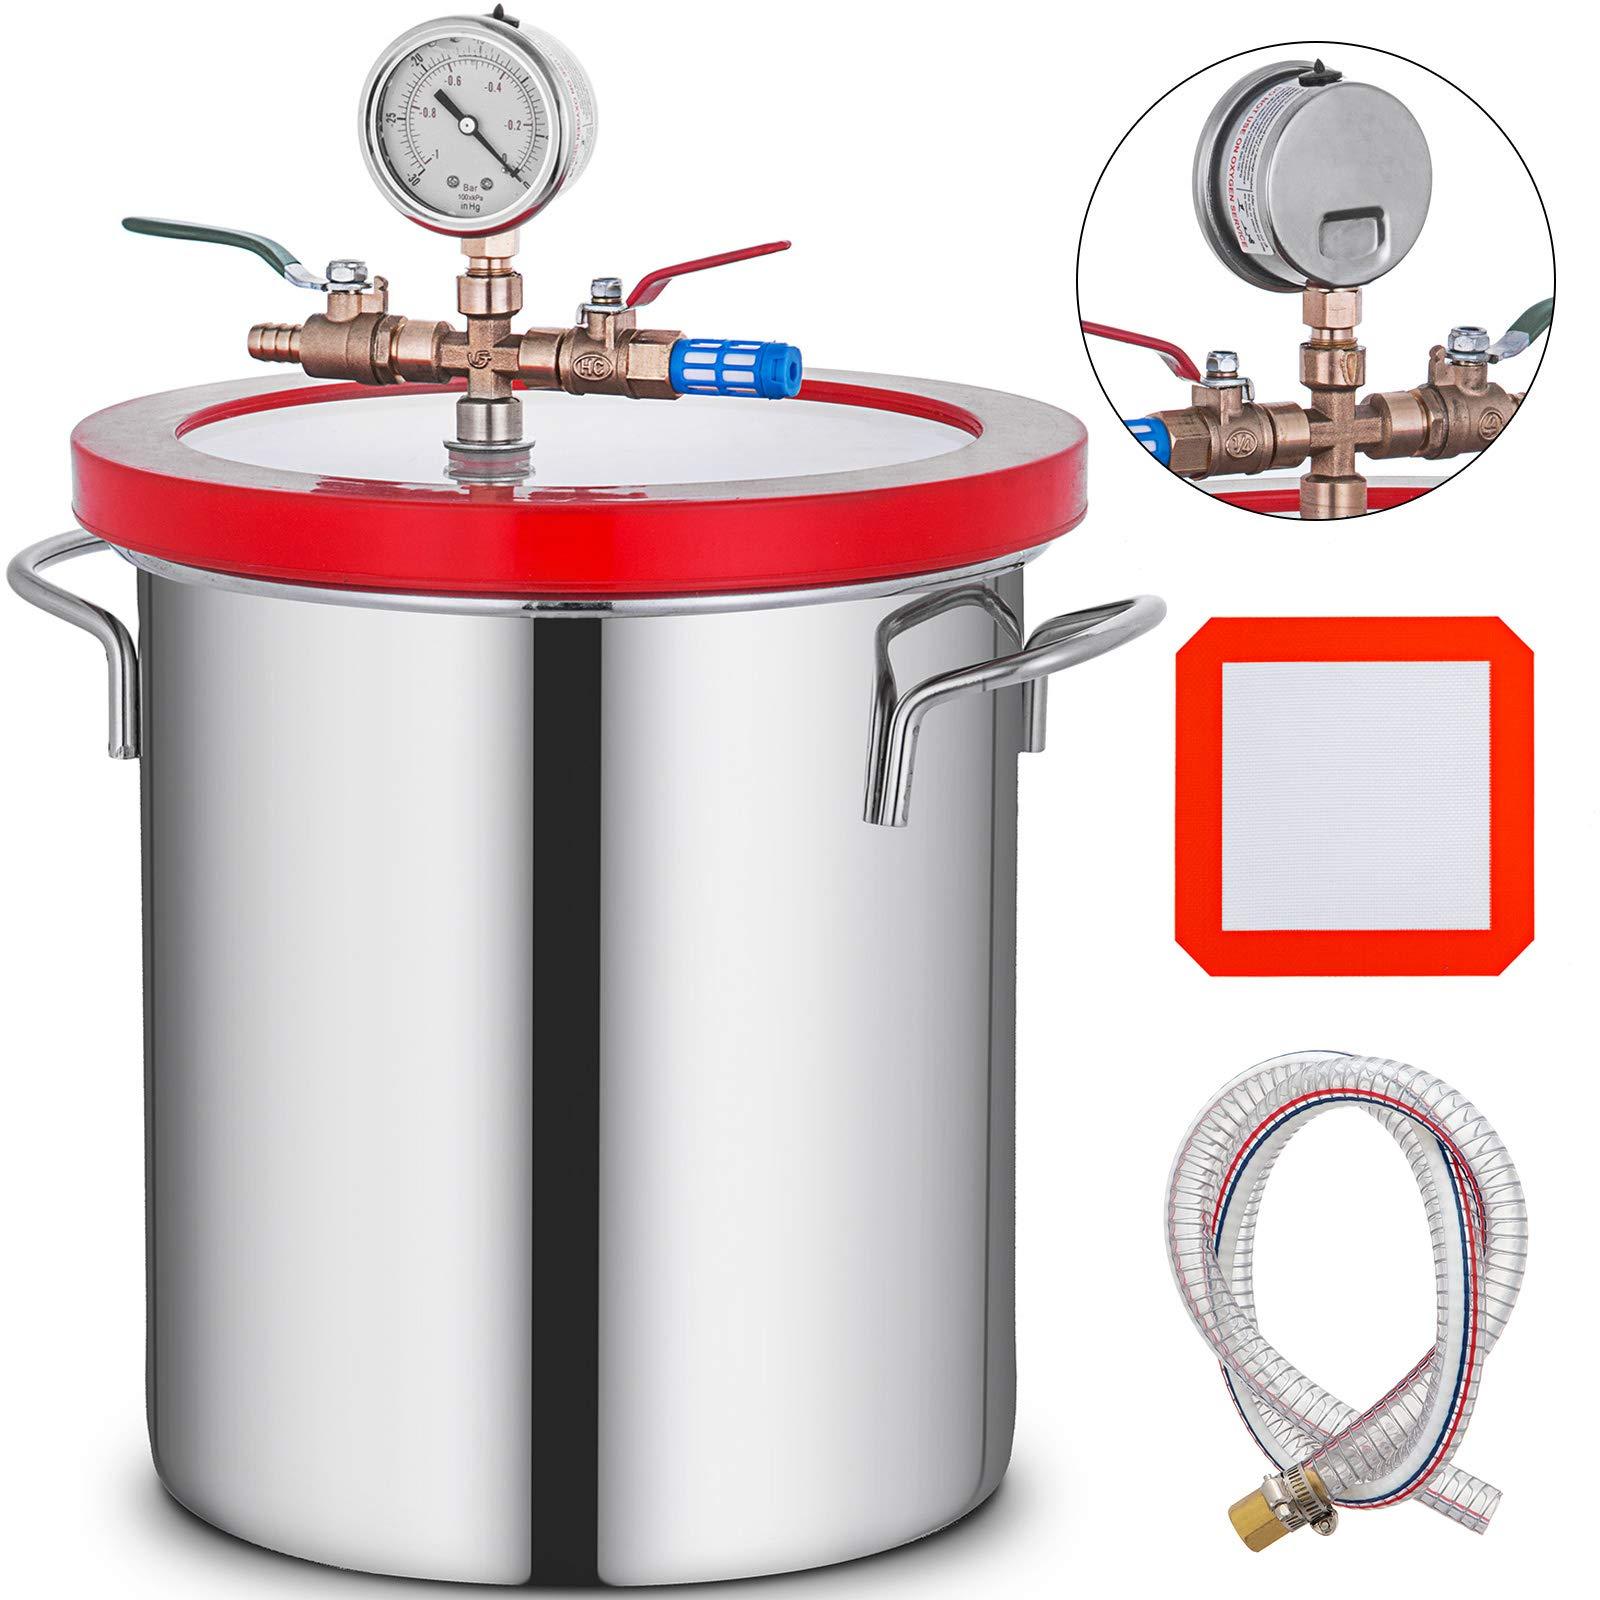 Bestauto 5 Gallon Vacuum Chamber Stainless Steel 160F Acrylic Lid